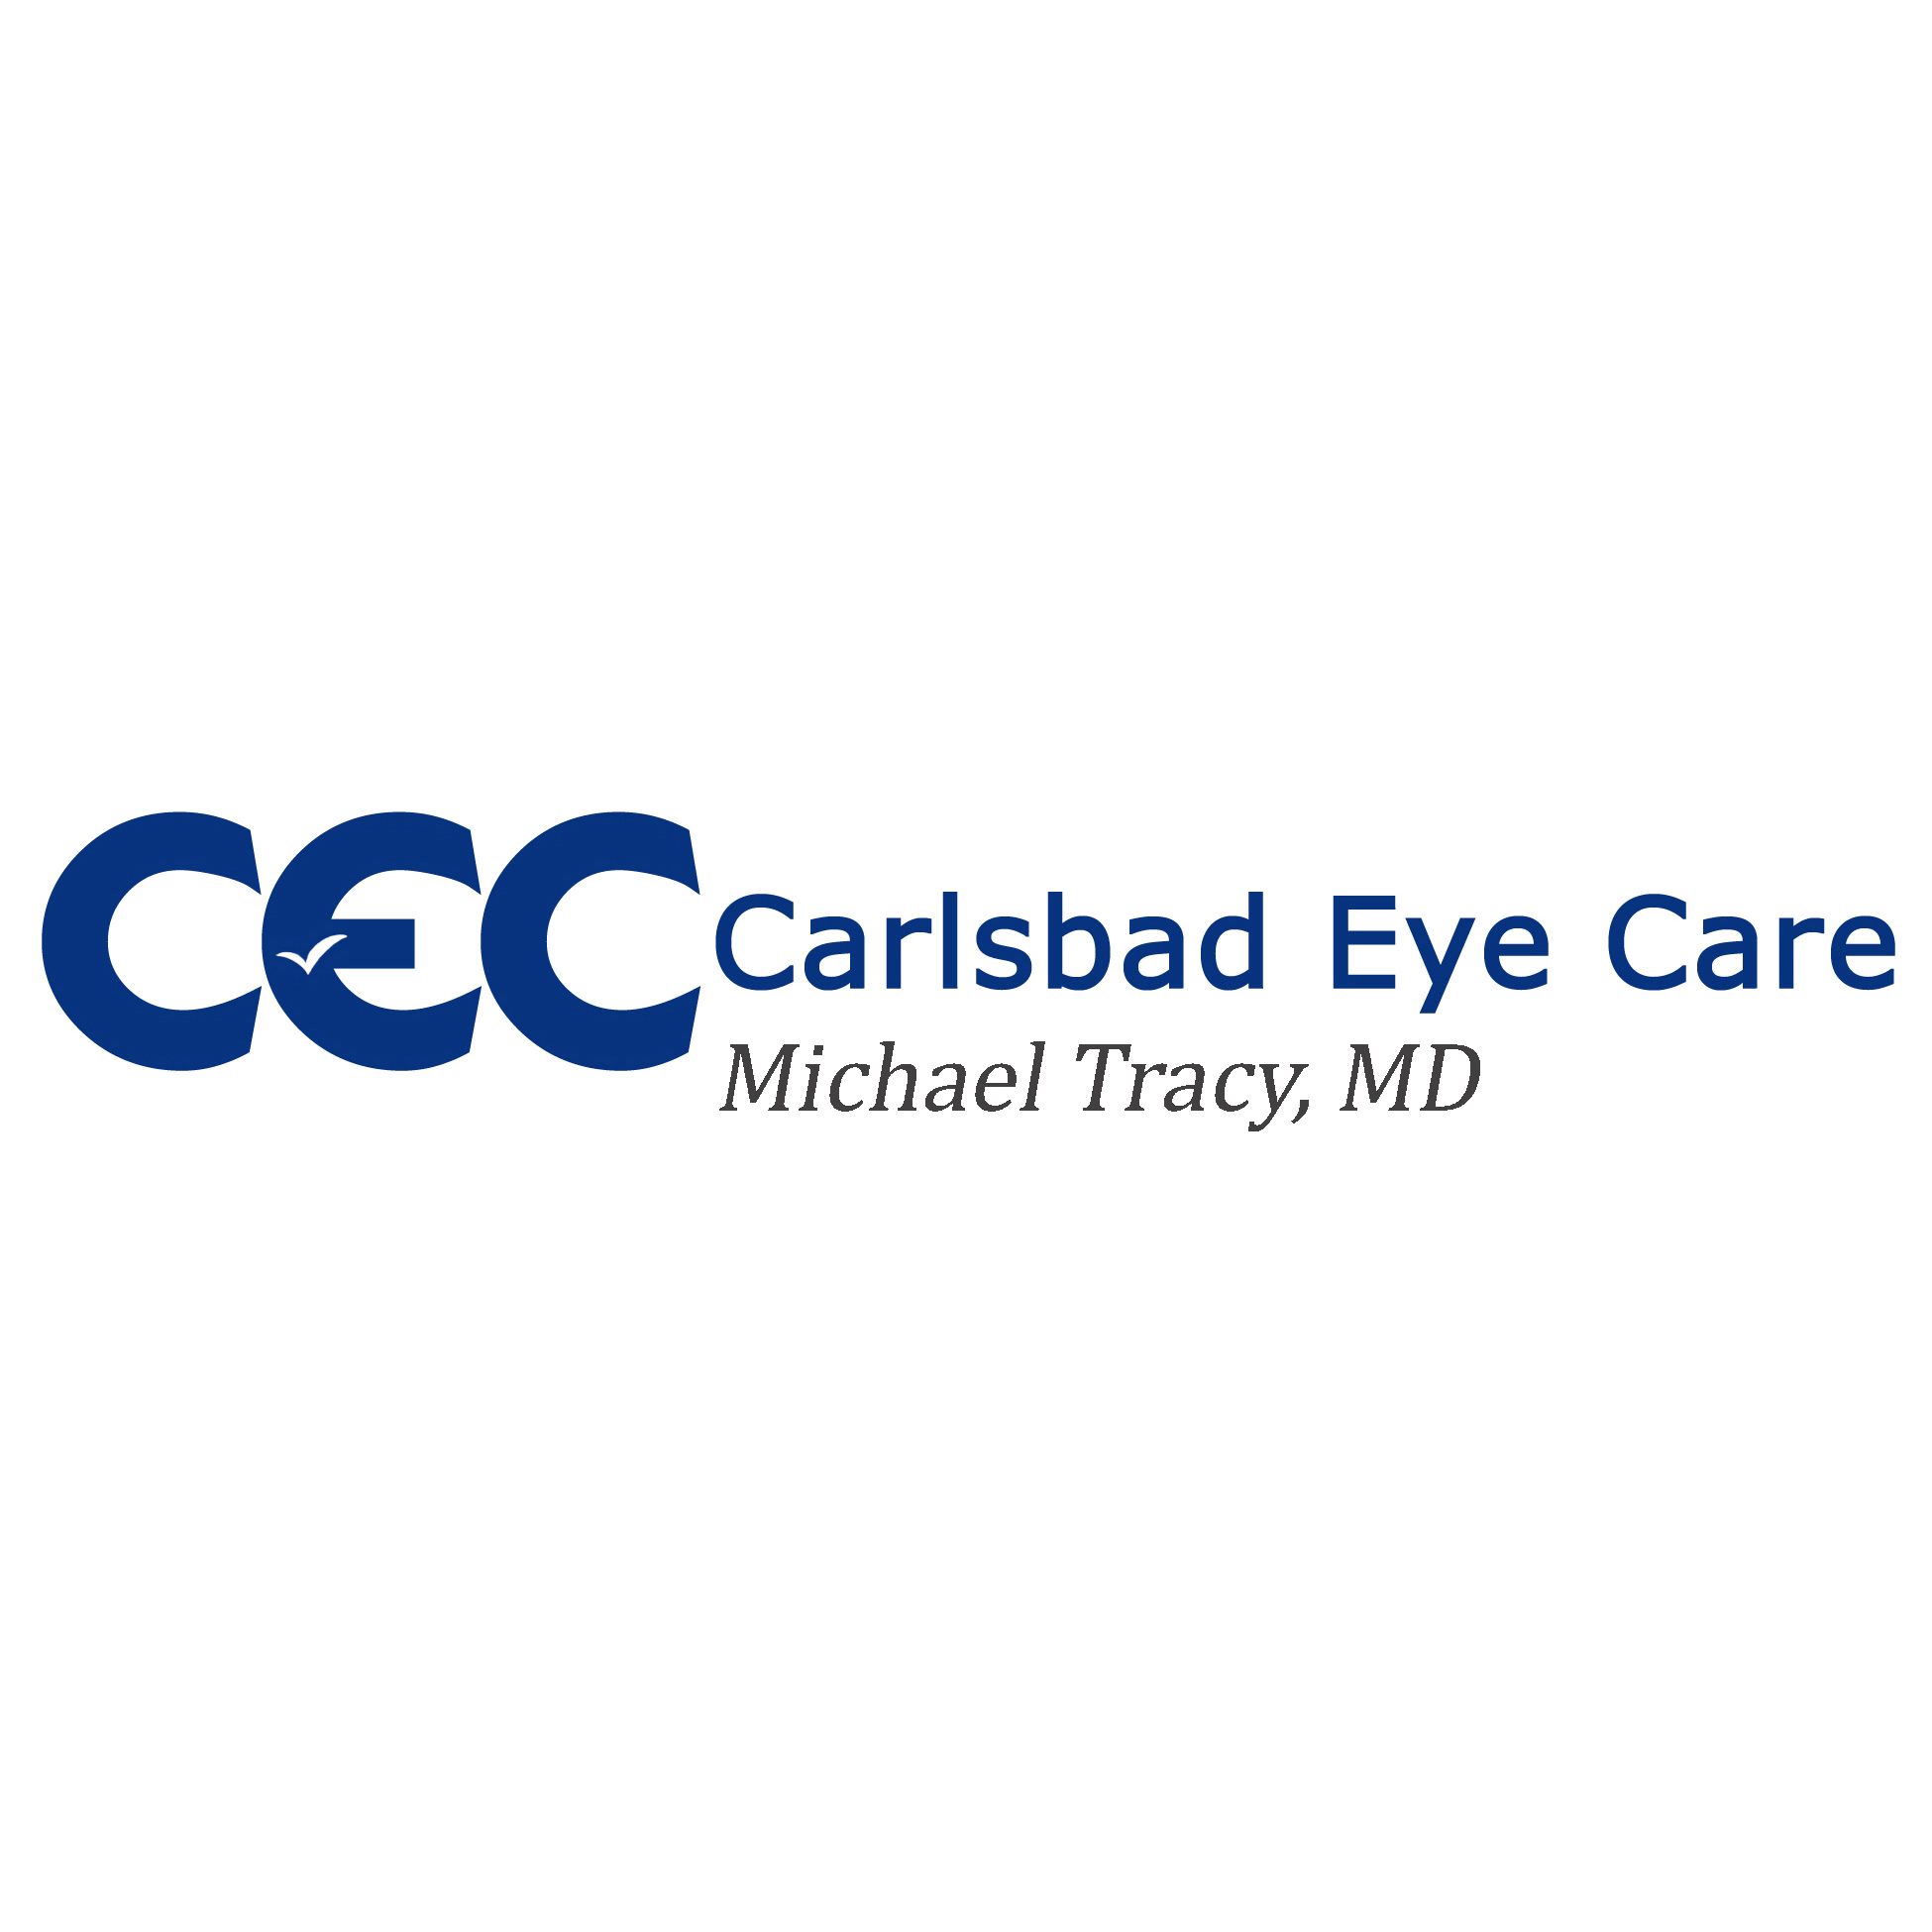 Carlsbad Eye Care - Carlsbad, CA - Ophthalmologists